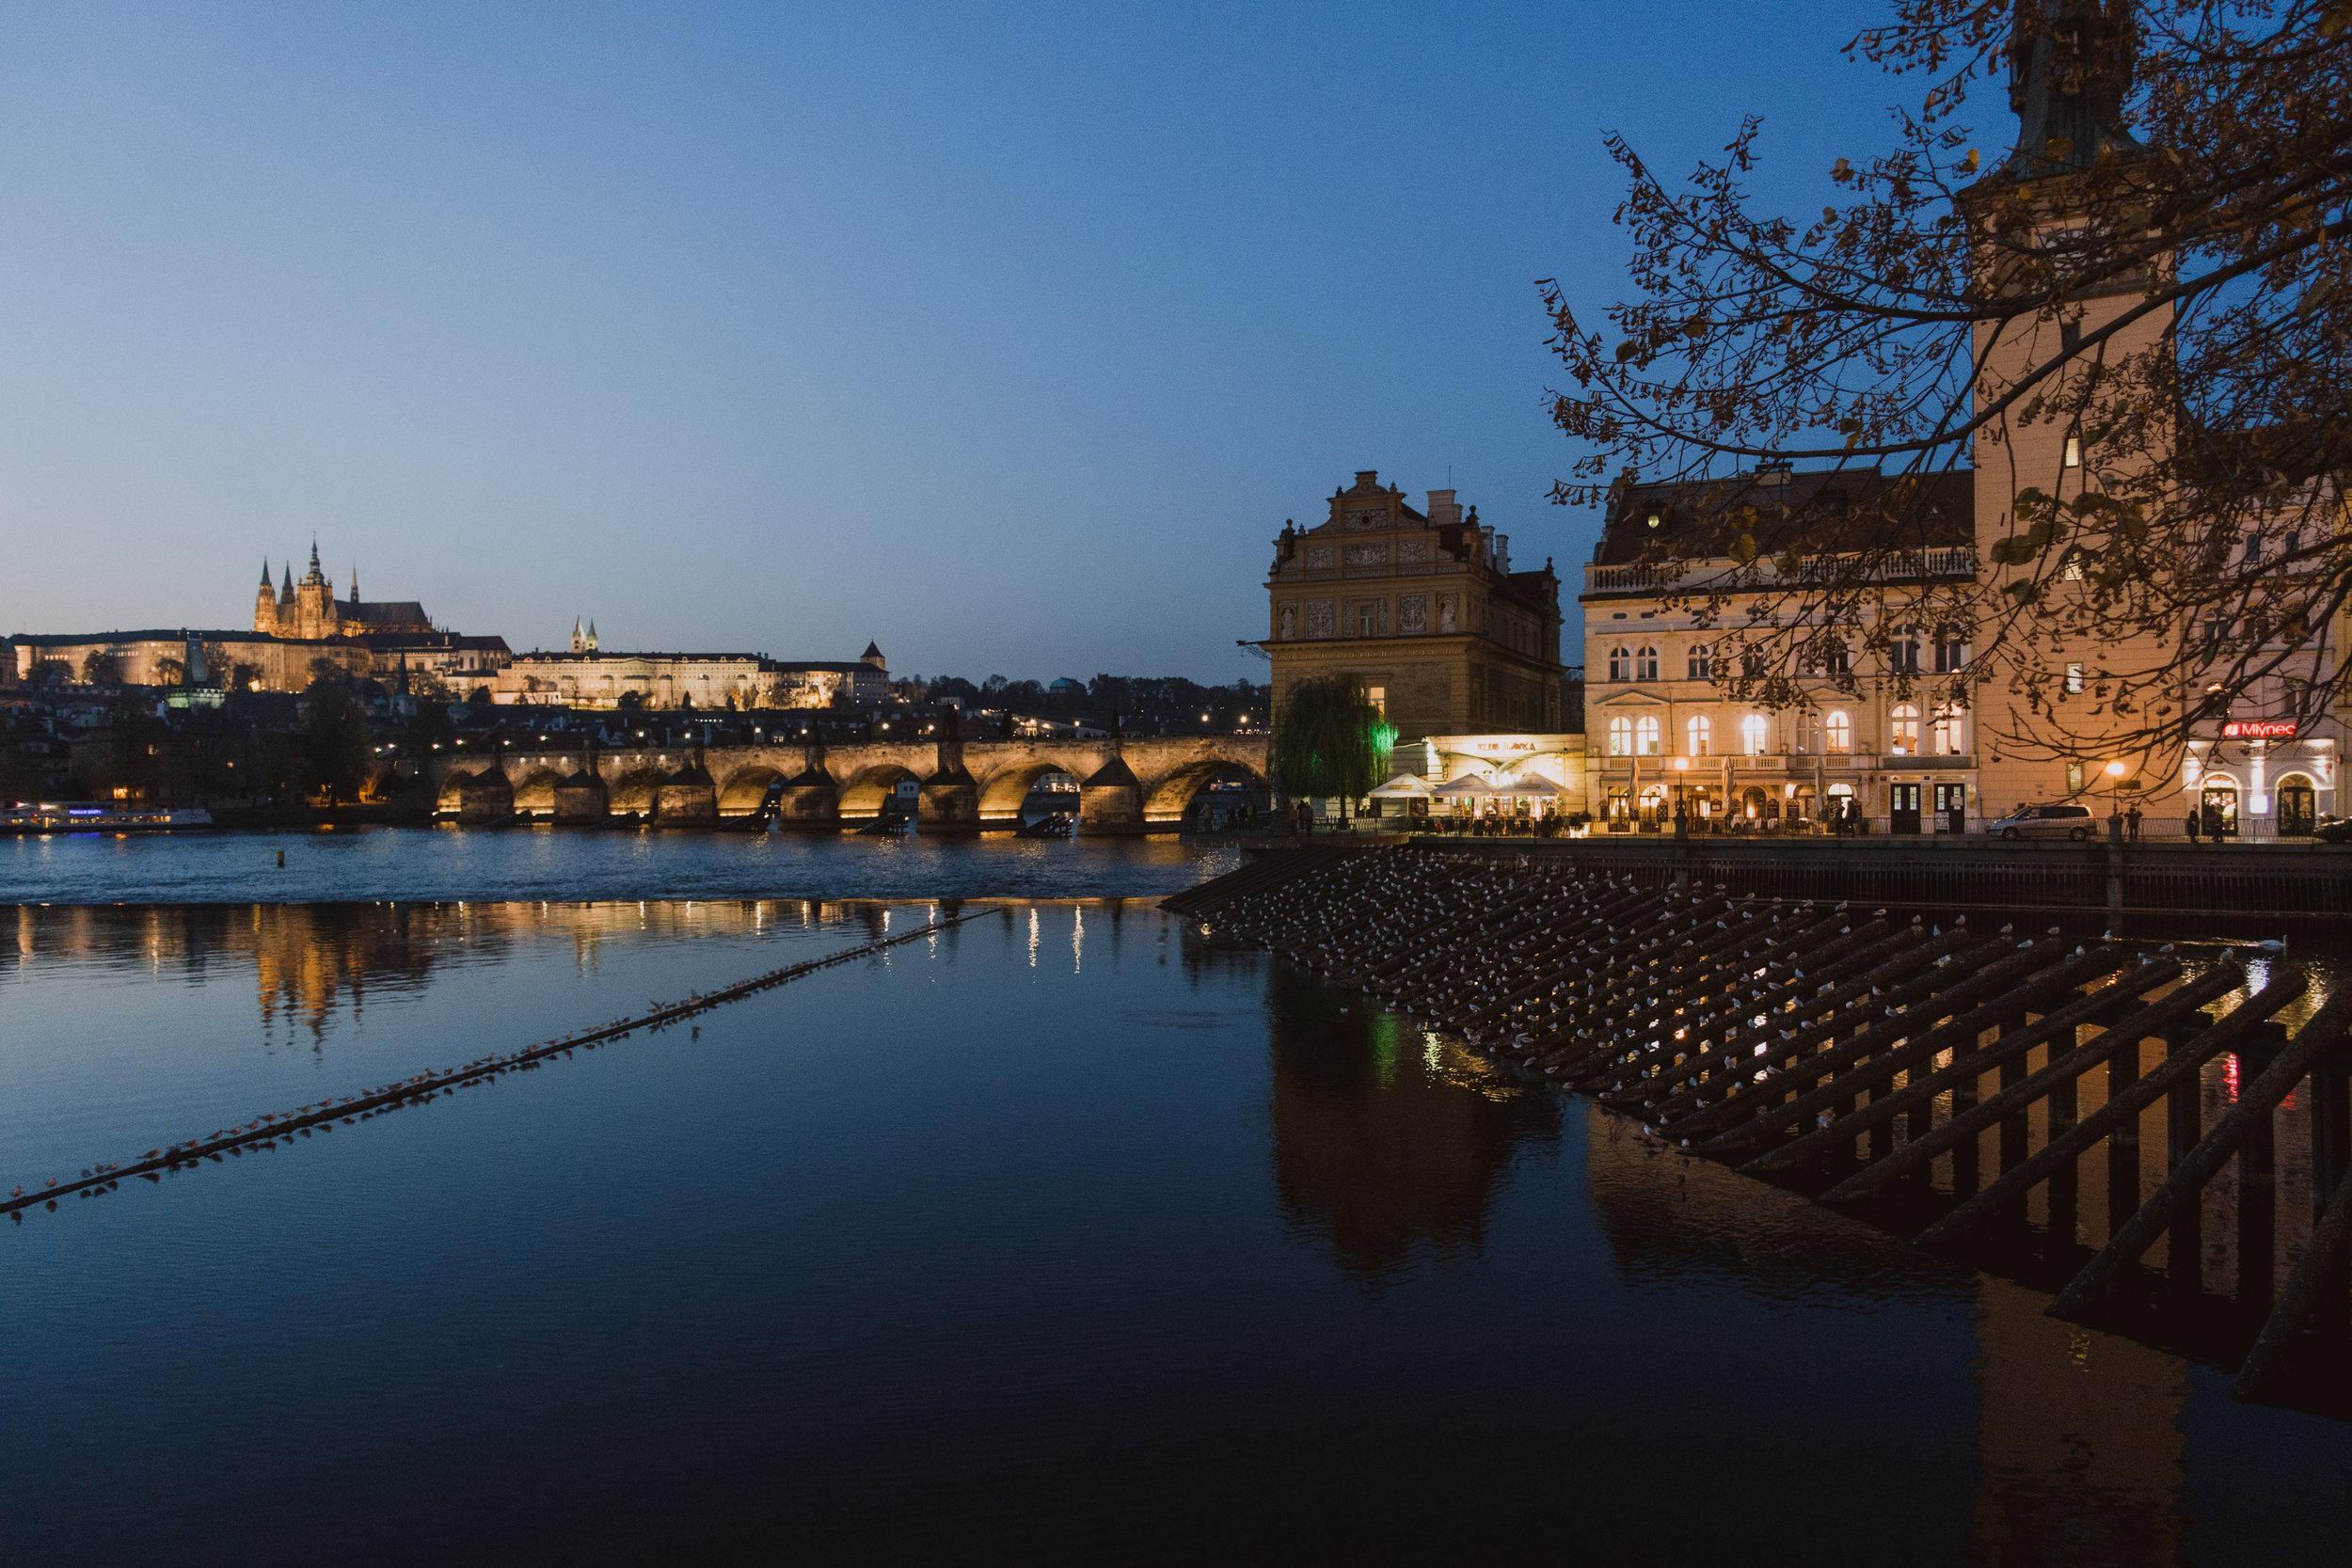 Praga-DSC02890.jpg